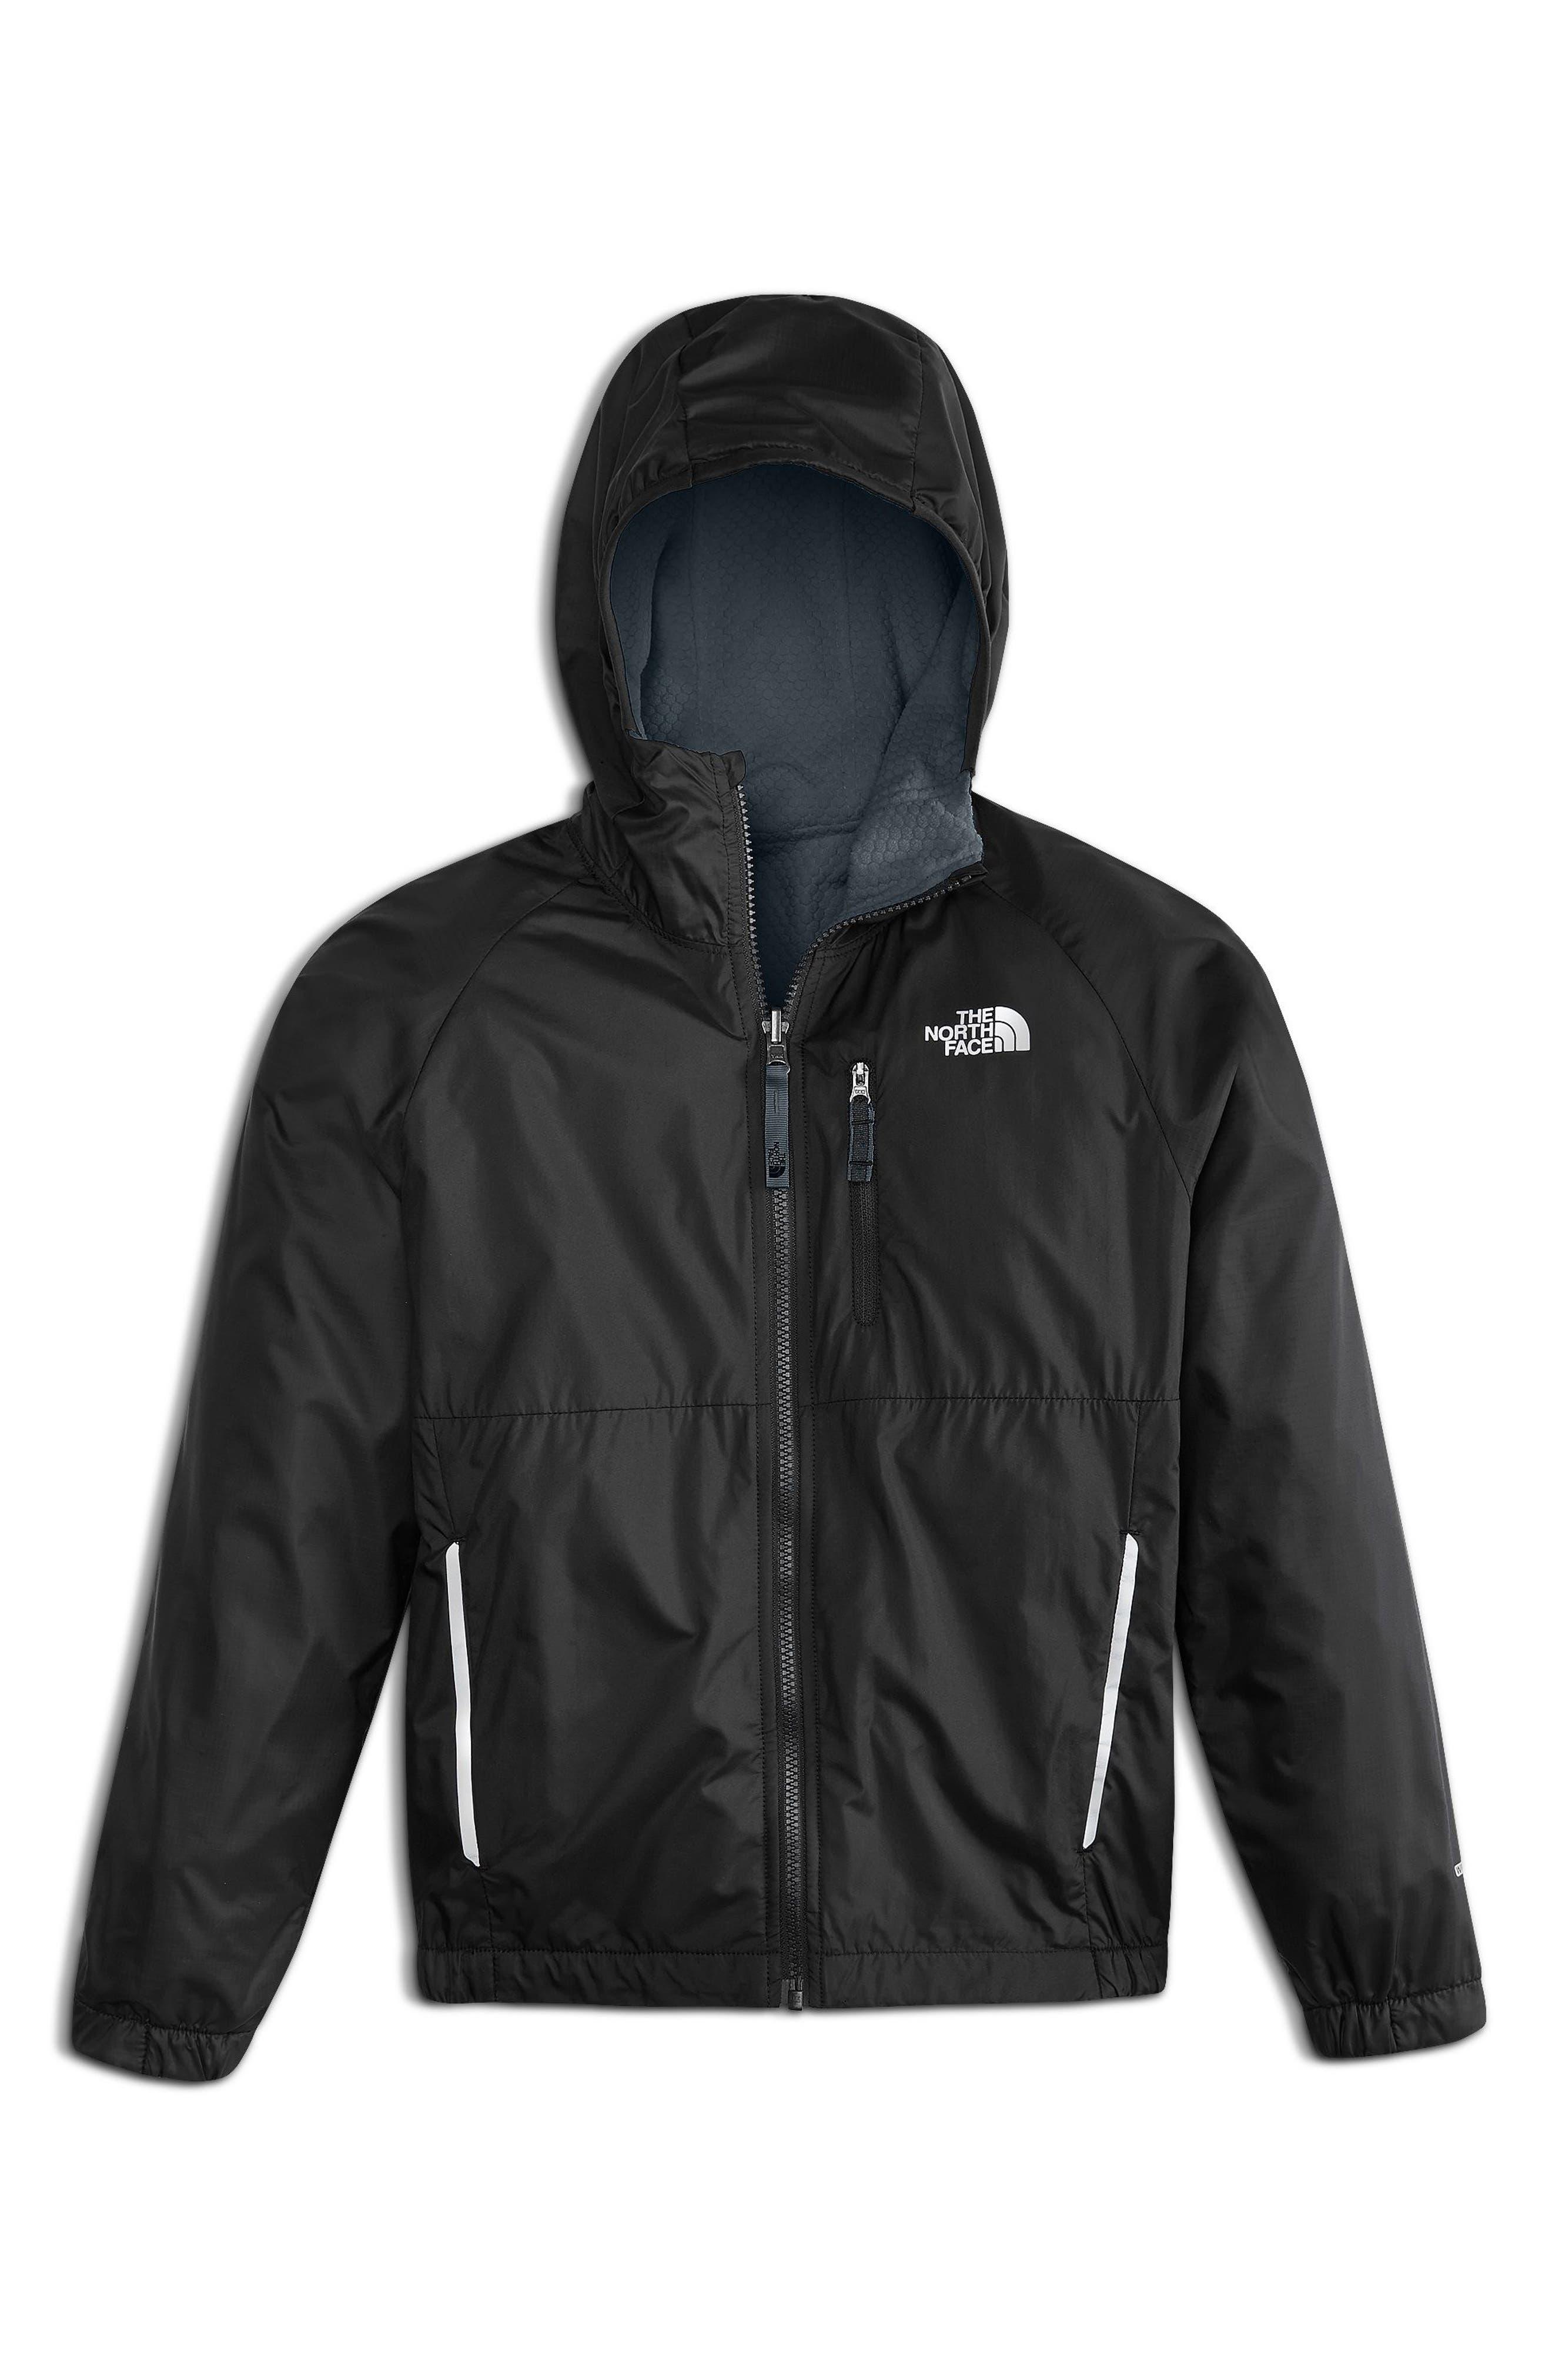 Breezeway Reversible Wind Jacket,                         Main,                         color, Tnf Black